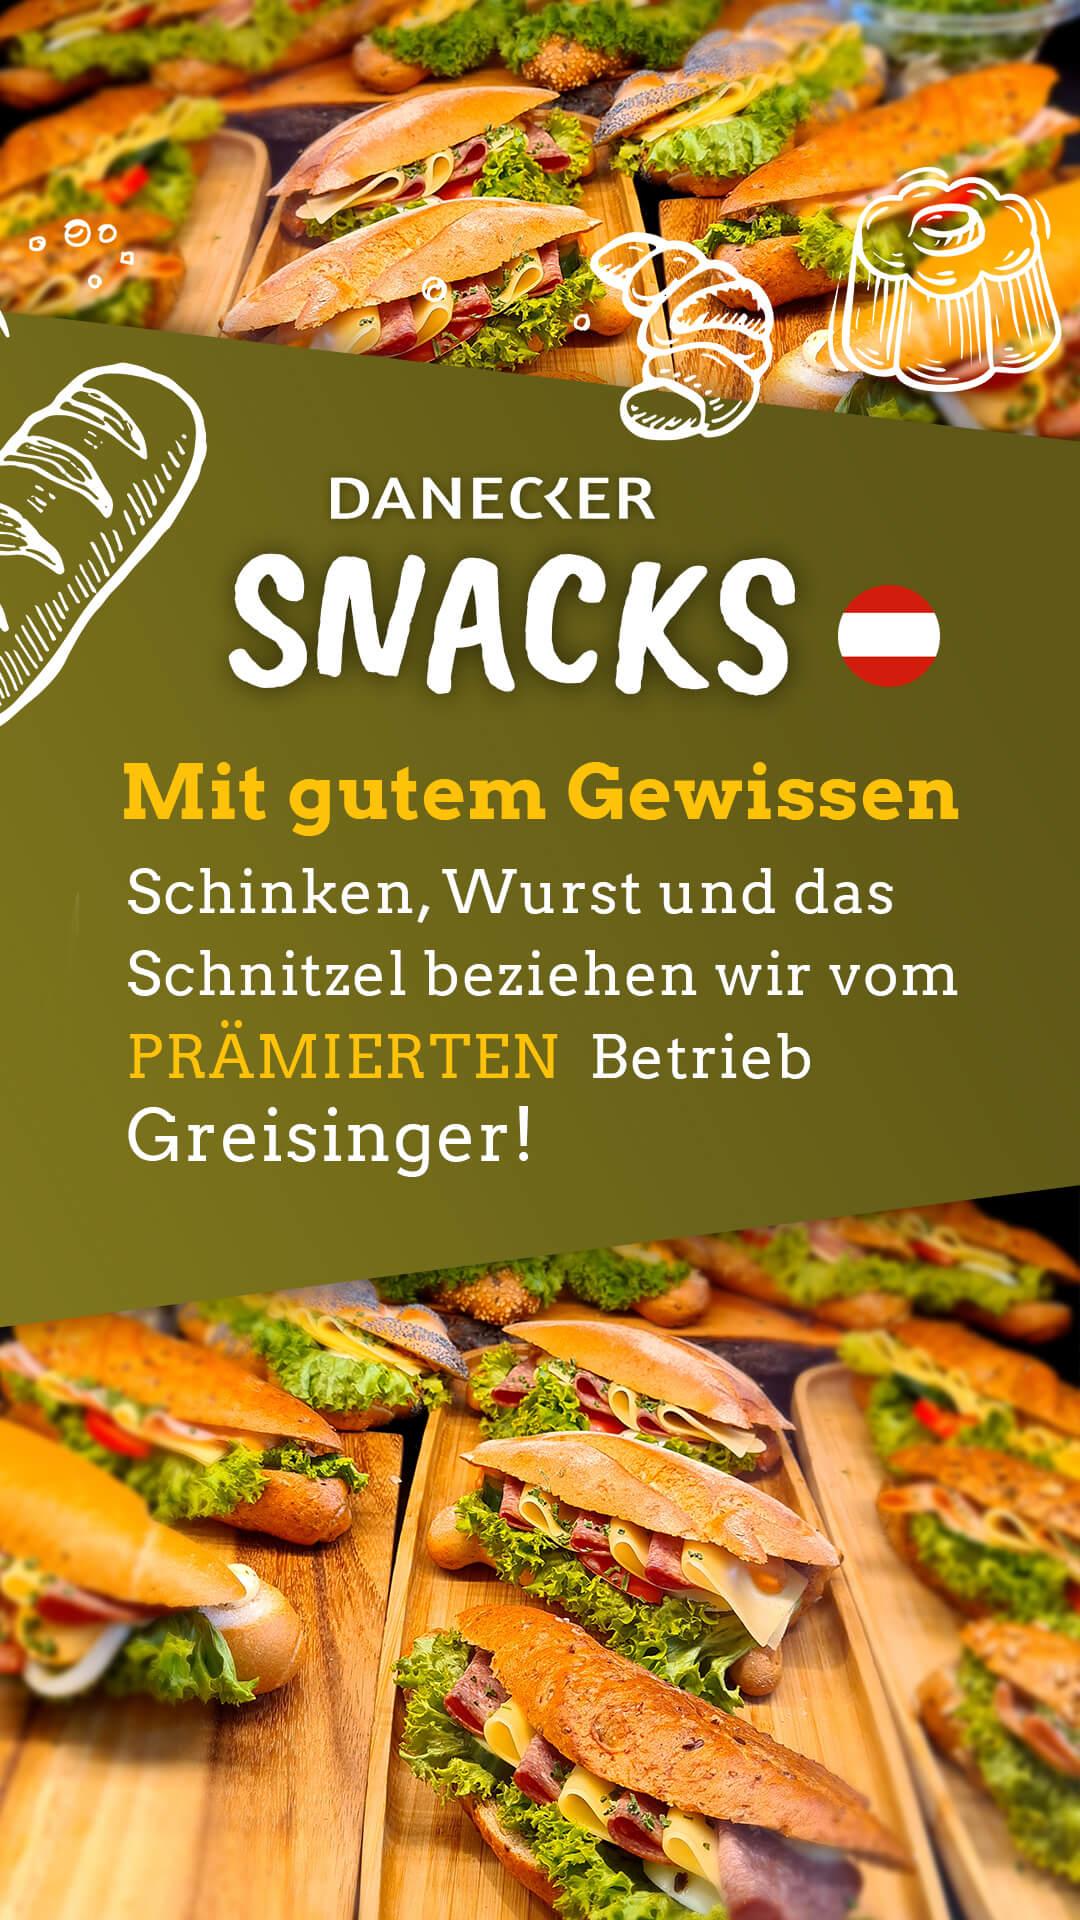 Snacks Jause Danecker Bäckerei Konditorei Amstetten Bahnhof, Allersdorf, Greinsfurth, Perg, Linz, Wallsee, Aschbach, Maue